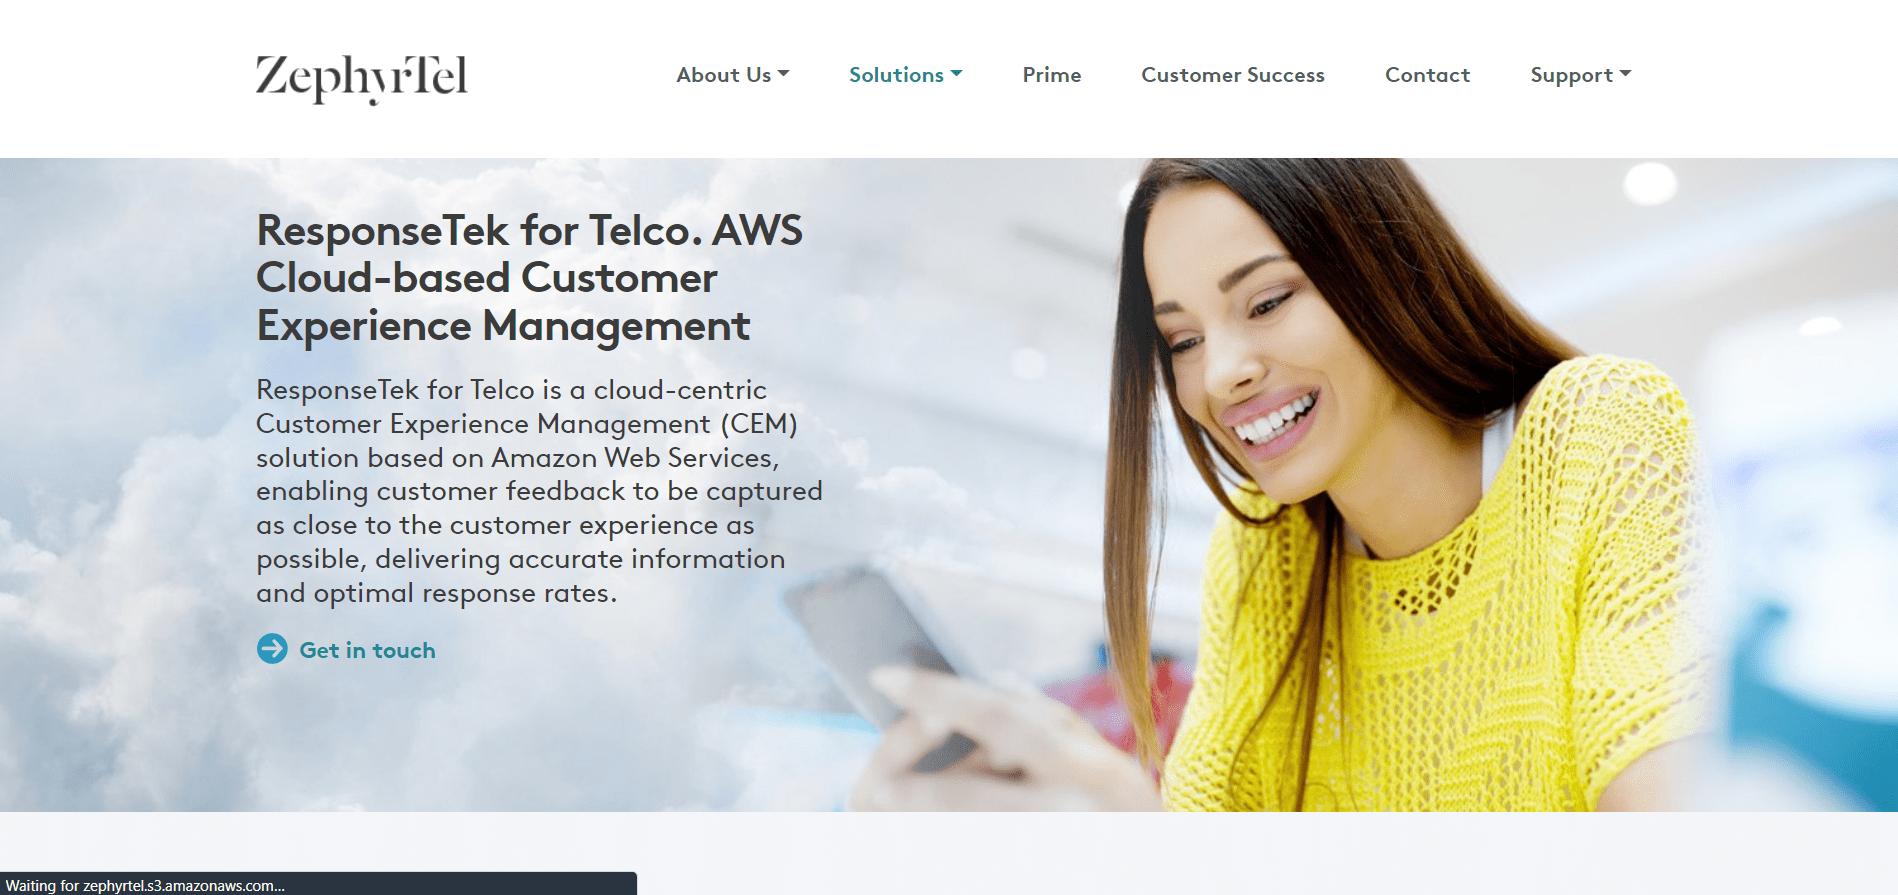 Responsetek customer experience management tool